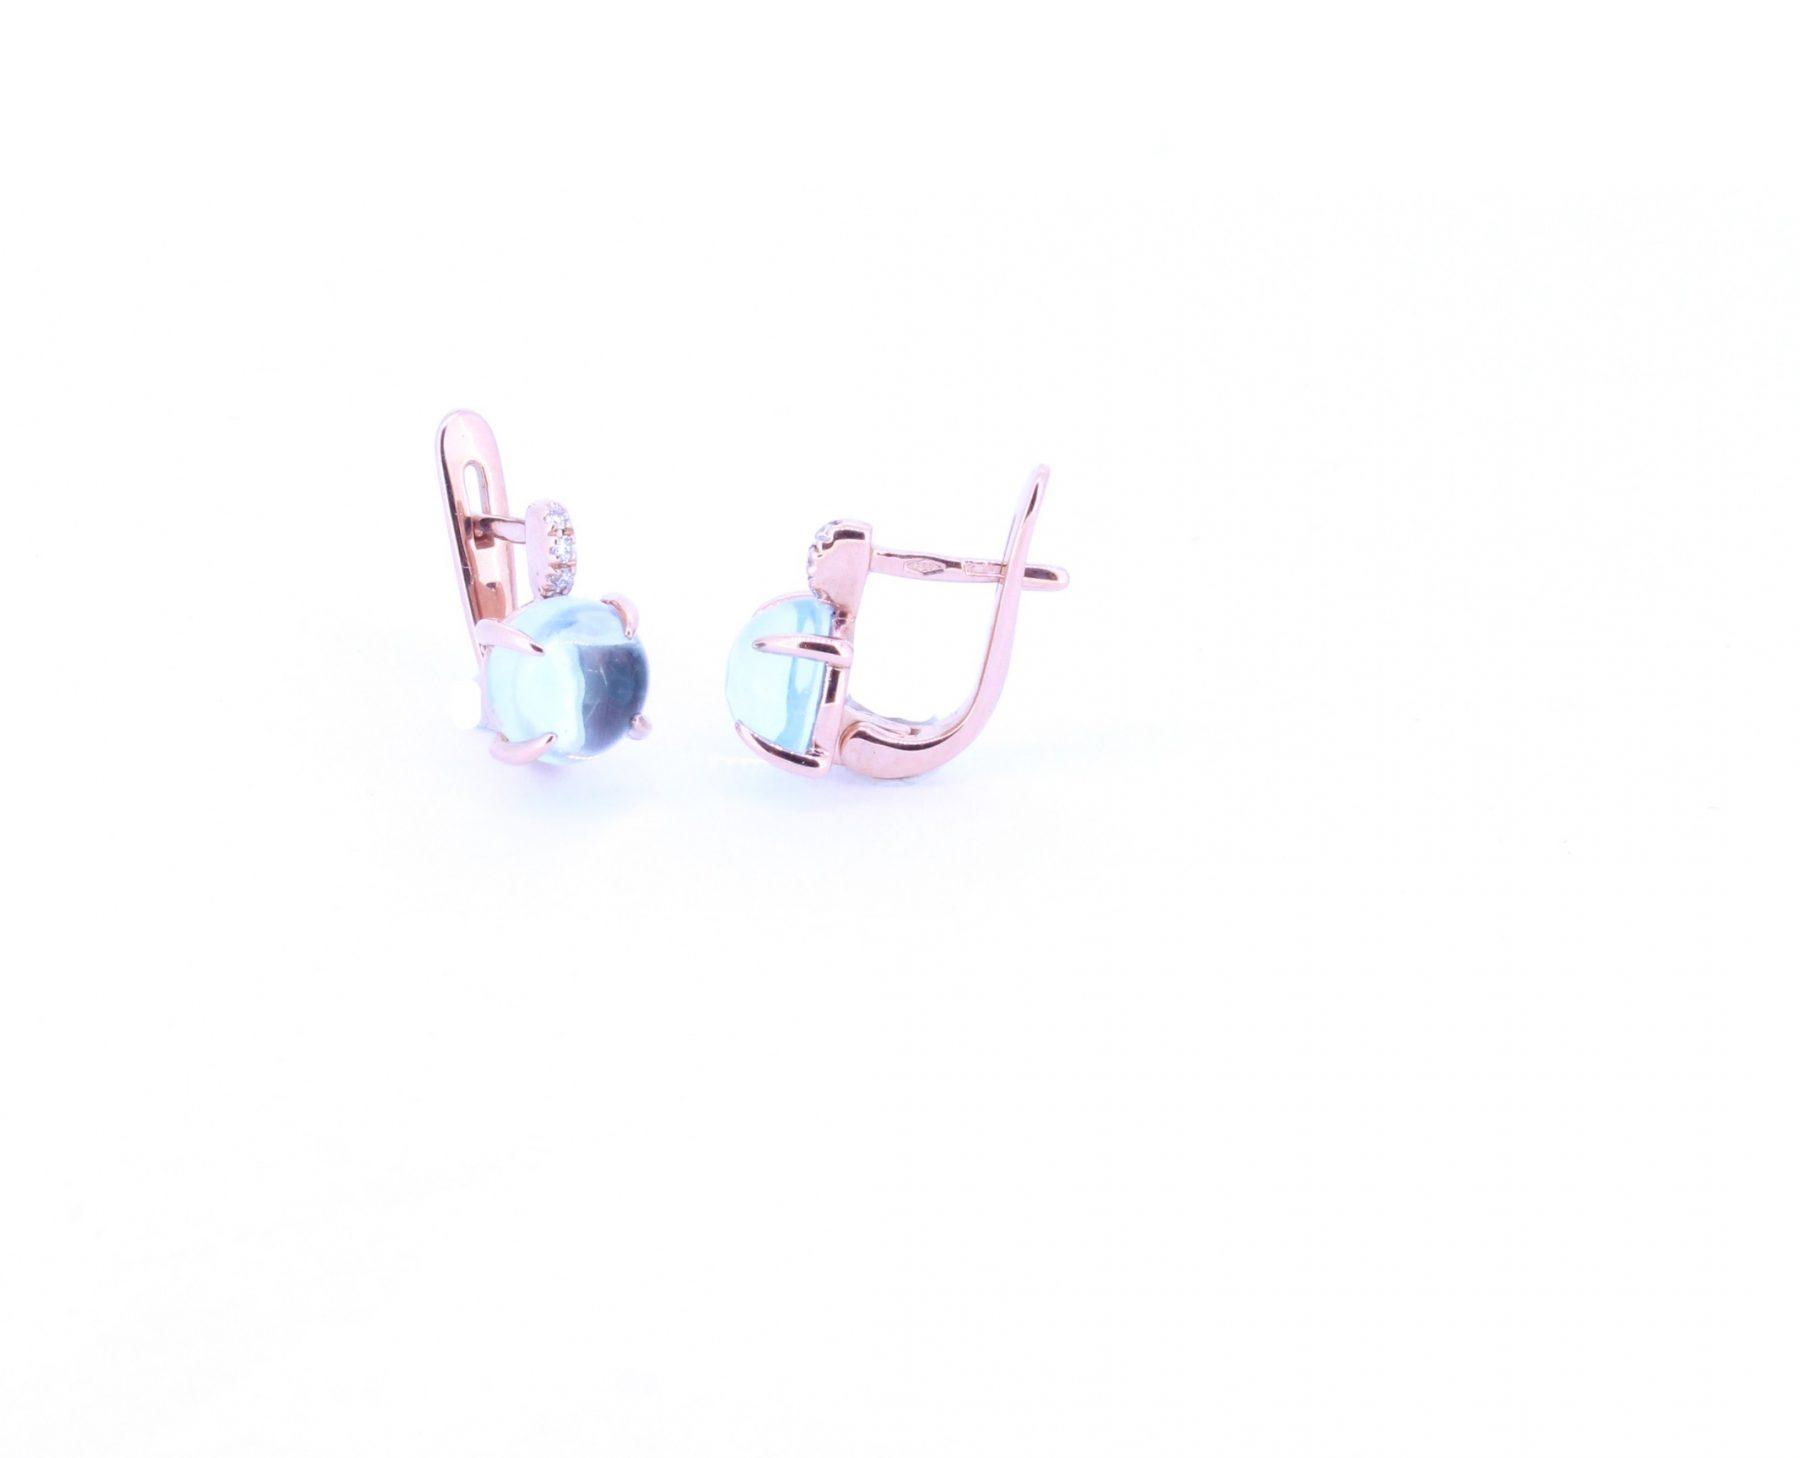 Ohrringe Candy Baby Topas sky - GalerieVoigt - FO2128R01001